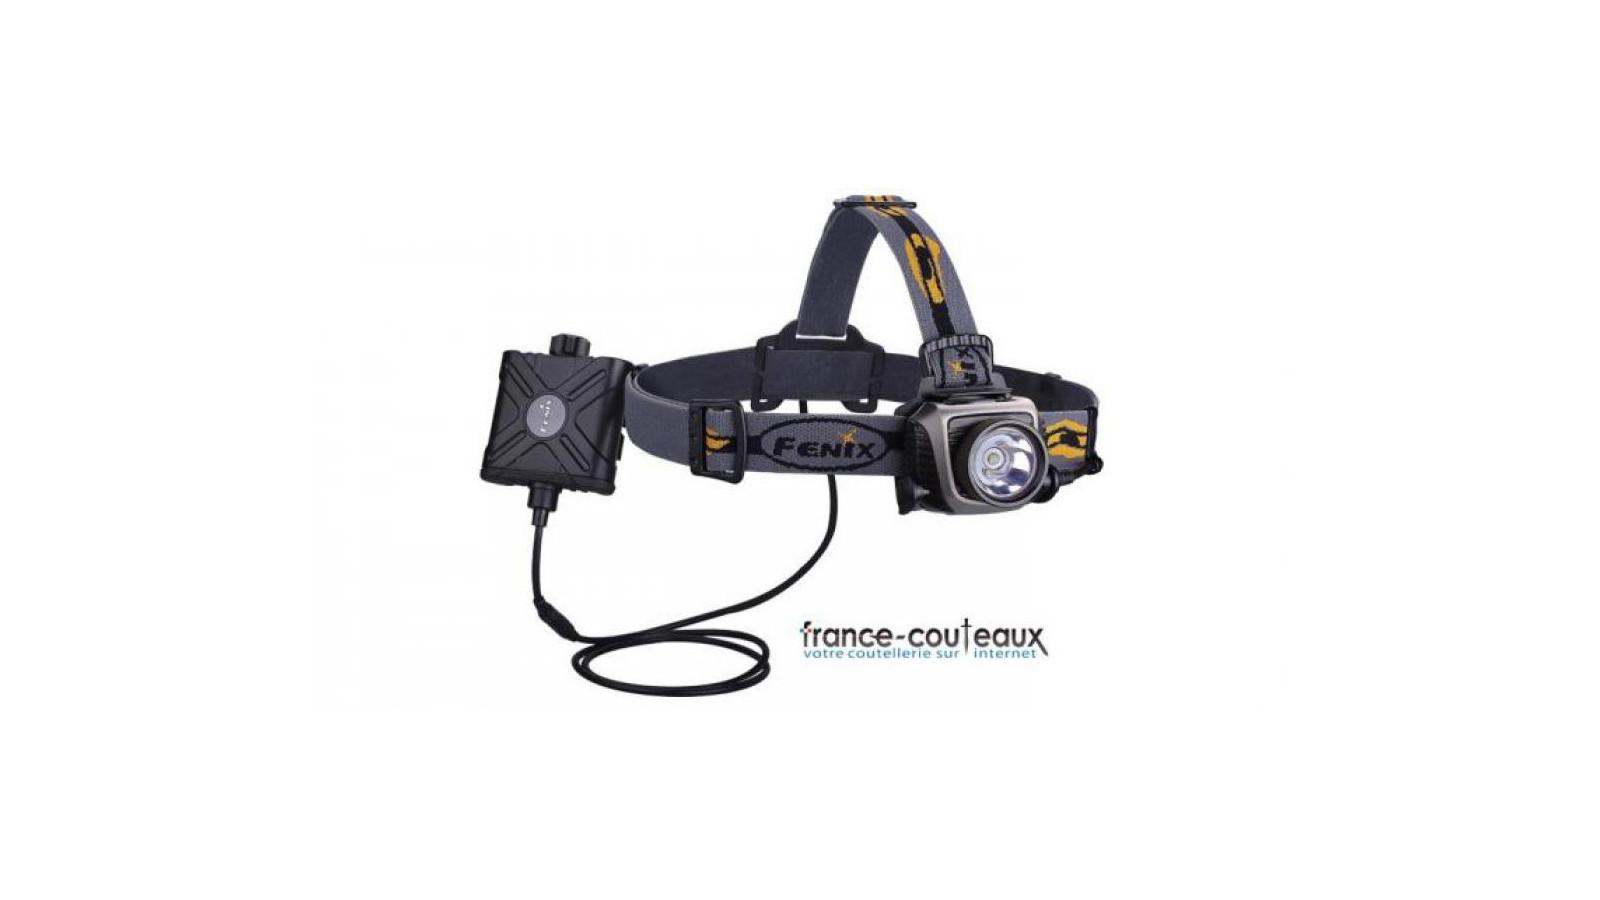 Matraque télescopique en acier trempé - 55cm